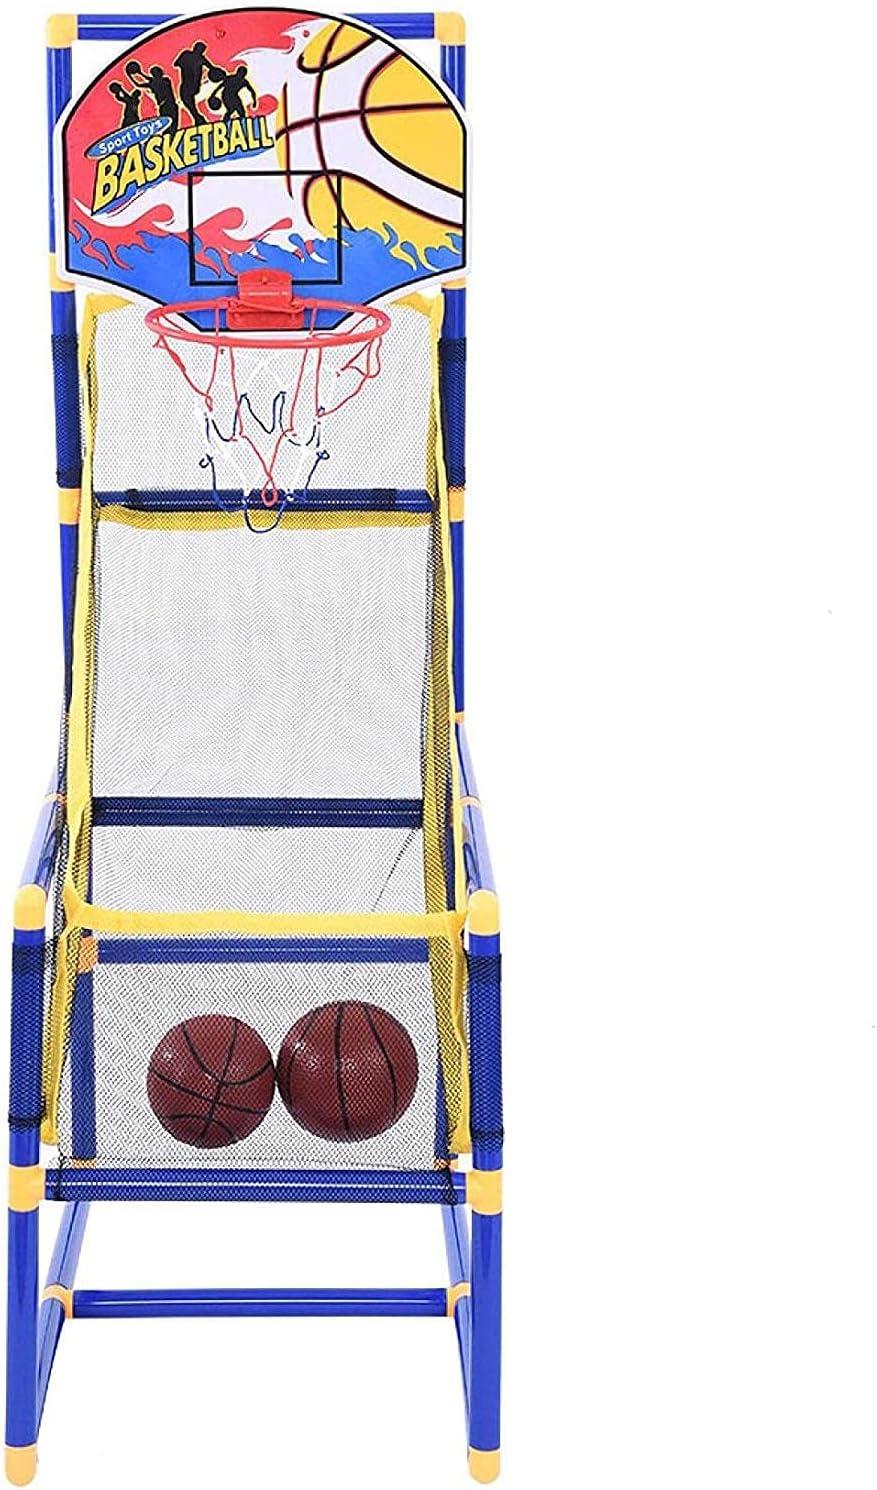 CargoTi ABSKids 70% Spring new work one after another OFF Outlet Arcade Basketball Game Shoot Hoop Baske Set -